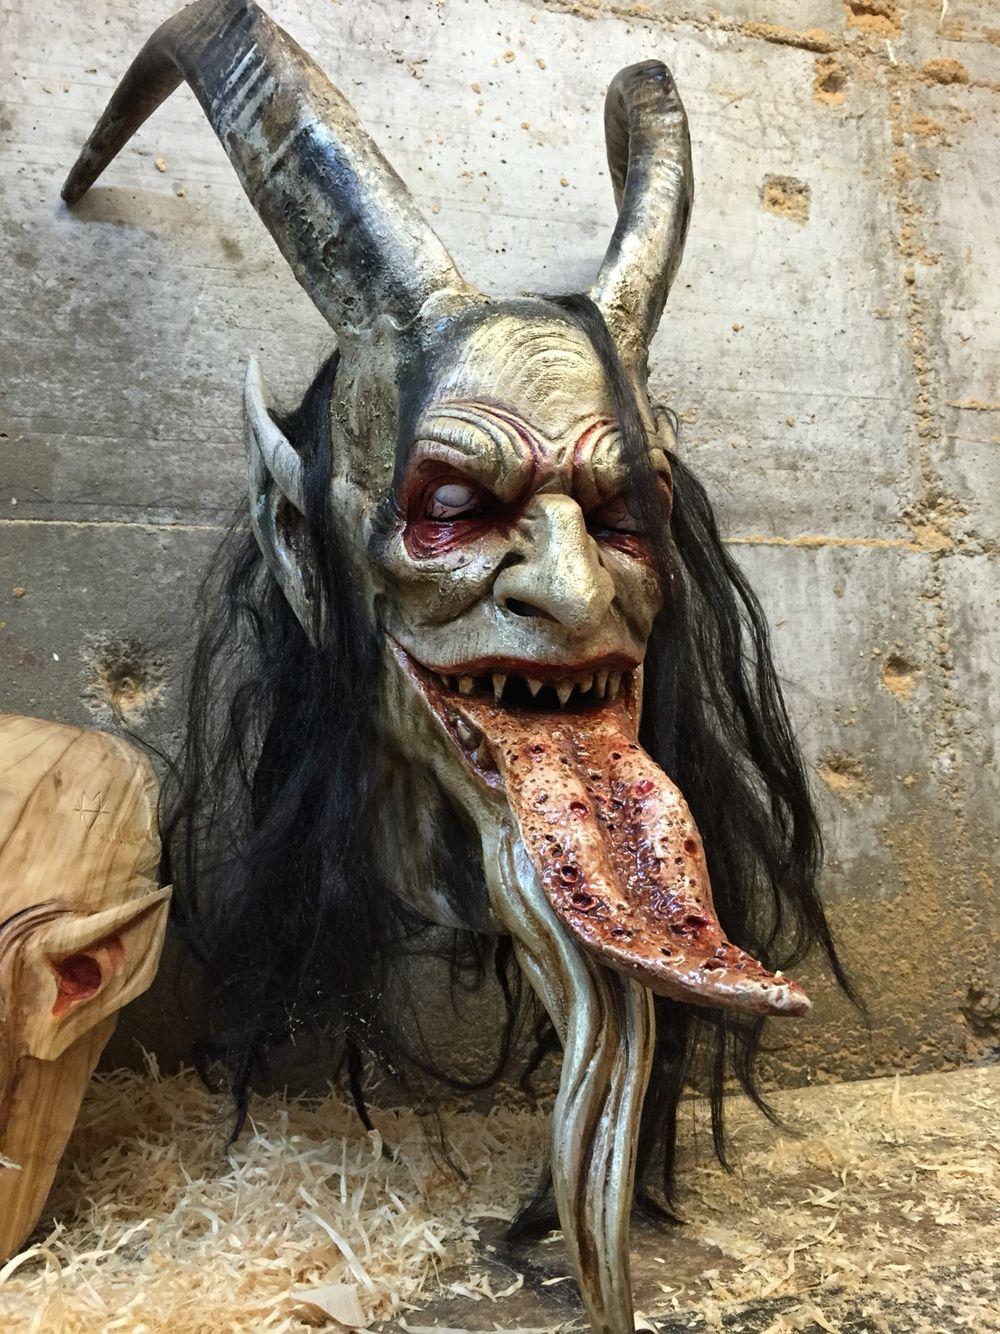 Krampusmask Out Of Wood Oil Painted Moinat Maskenarthur Moinat